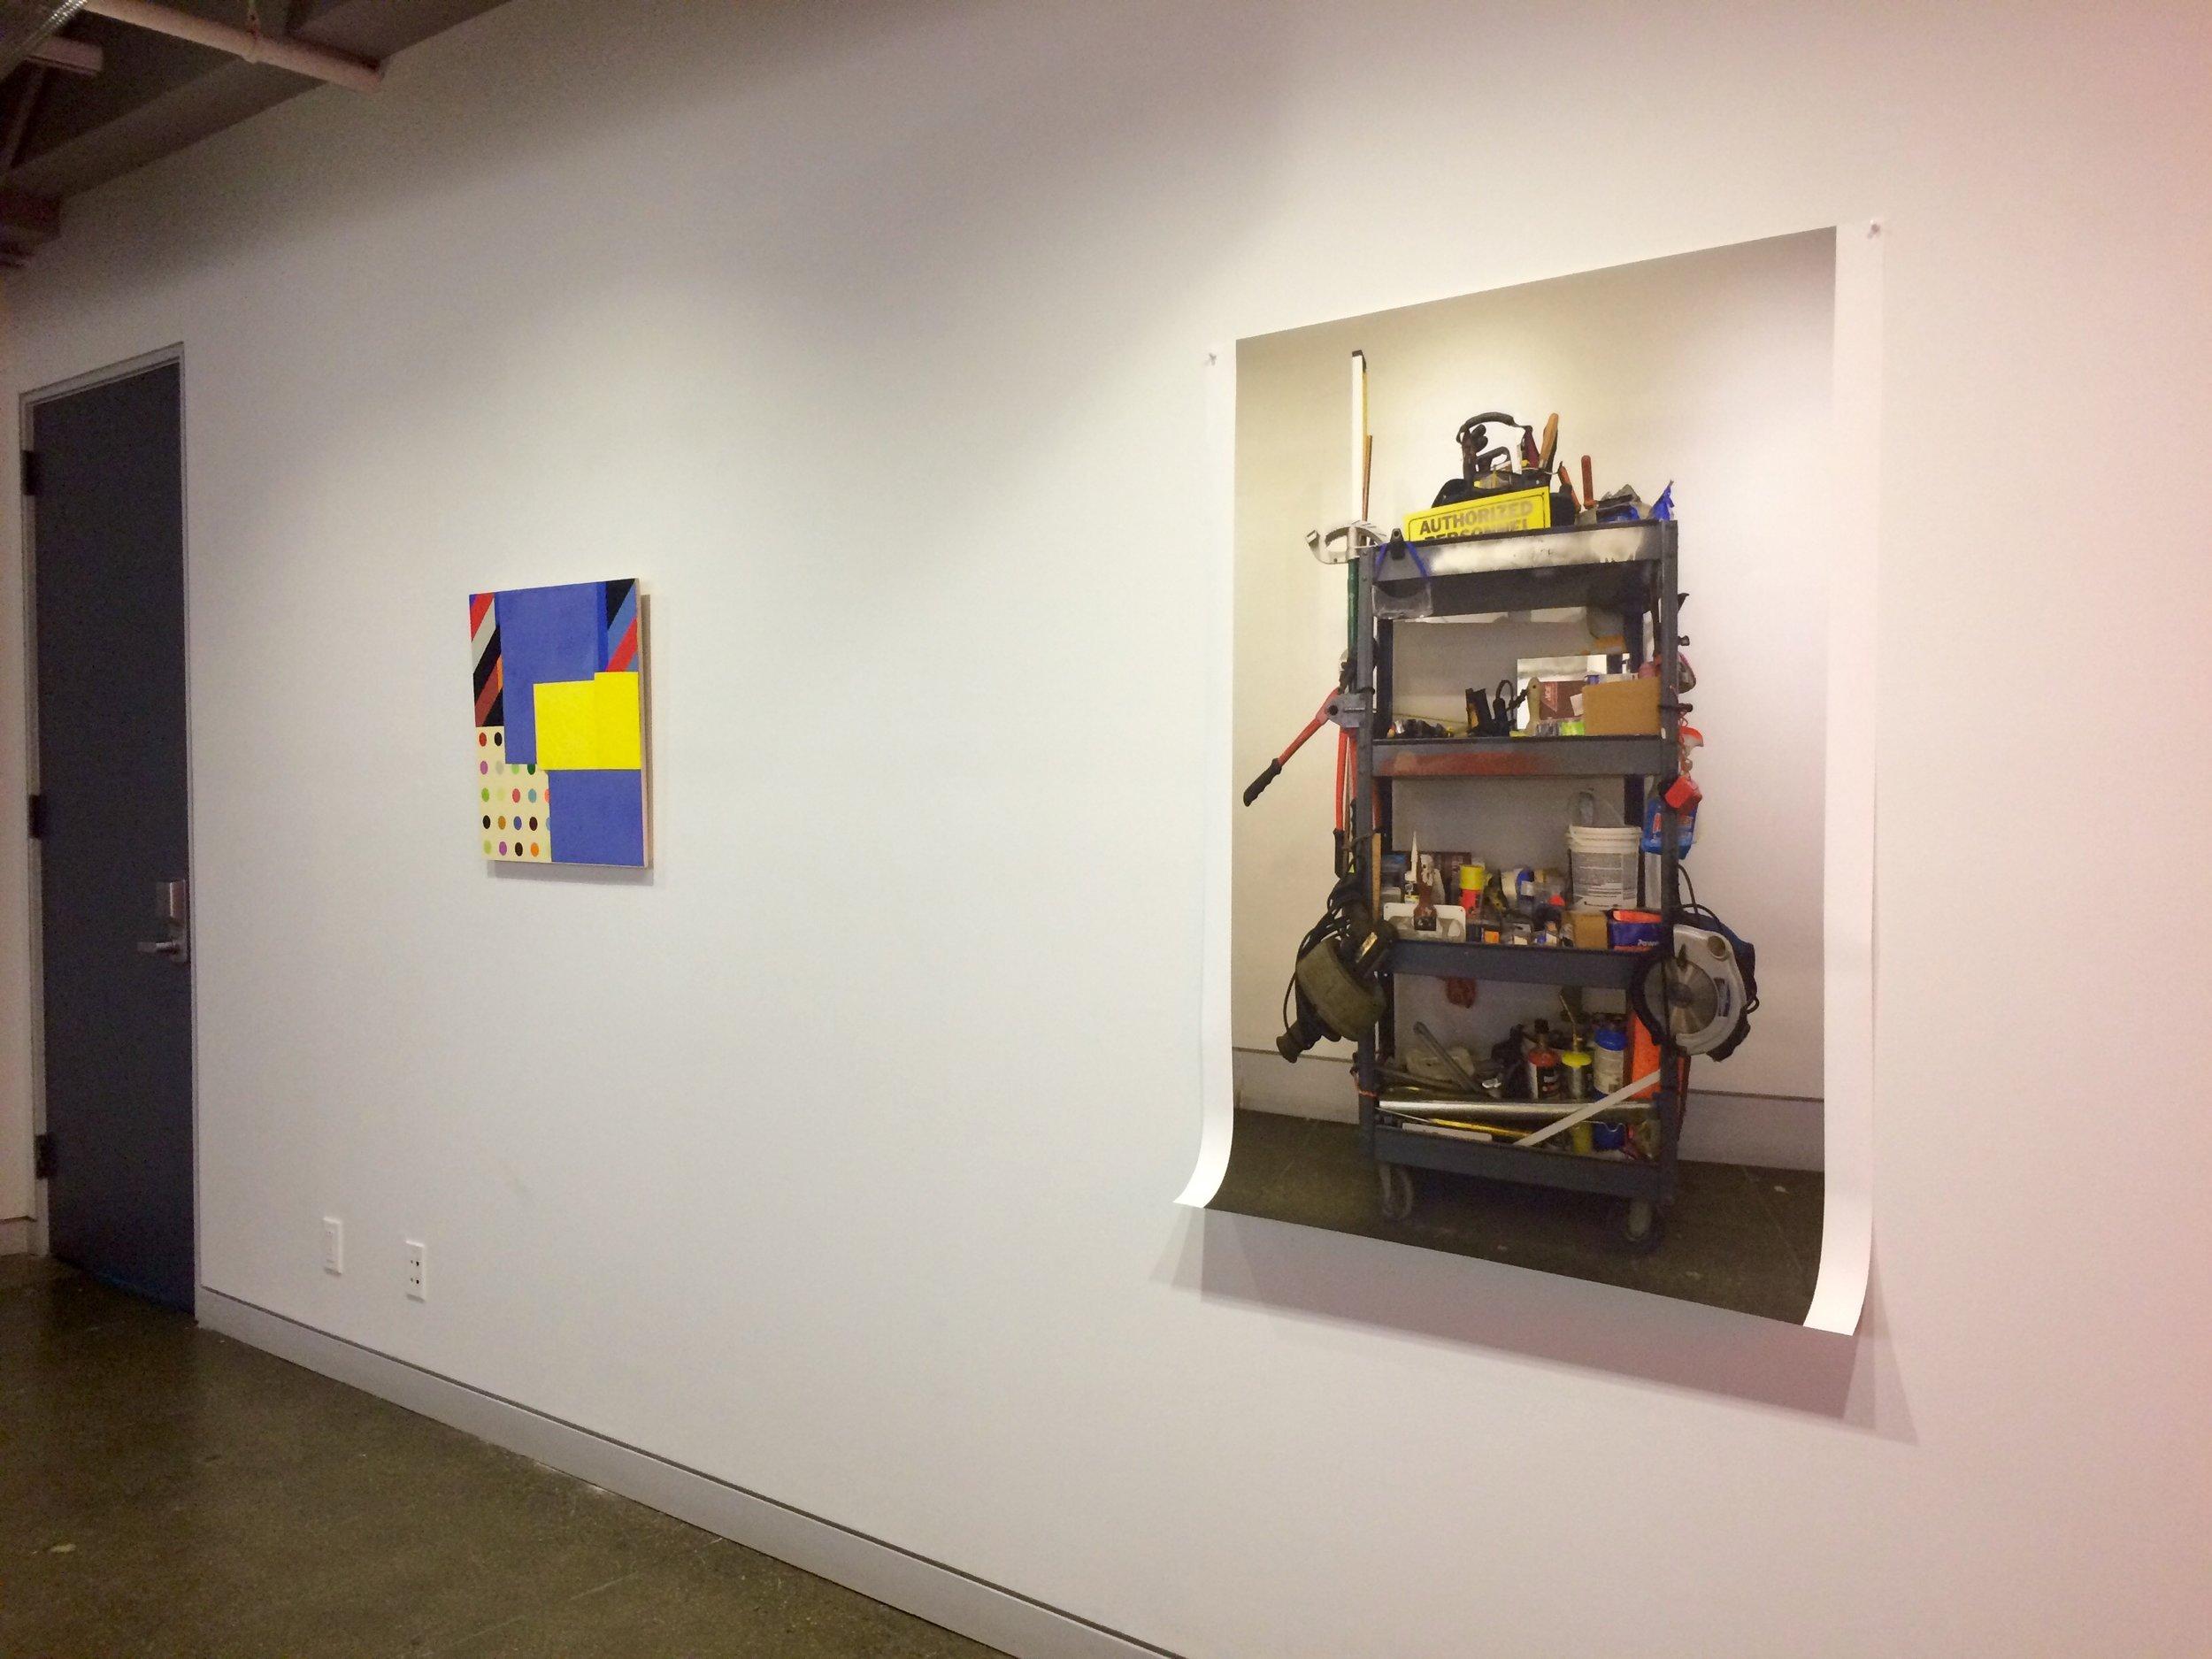 Jason Stewart (L) & Alex Credle (R)   Jason Stewart  Reconstruct #107  Fabric and Acrylic on Panel 2016  Alex Credle  Time Waits for No One  Digital Print 2017